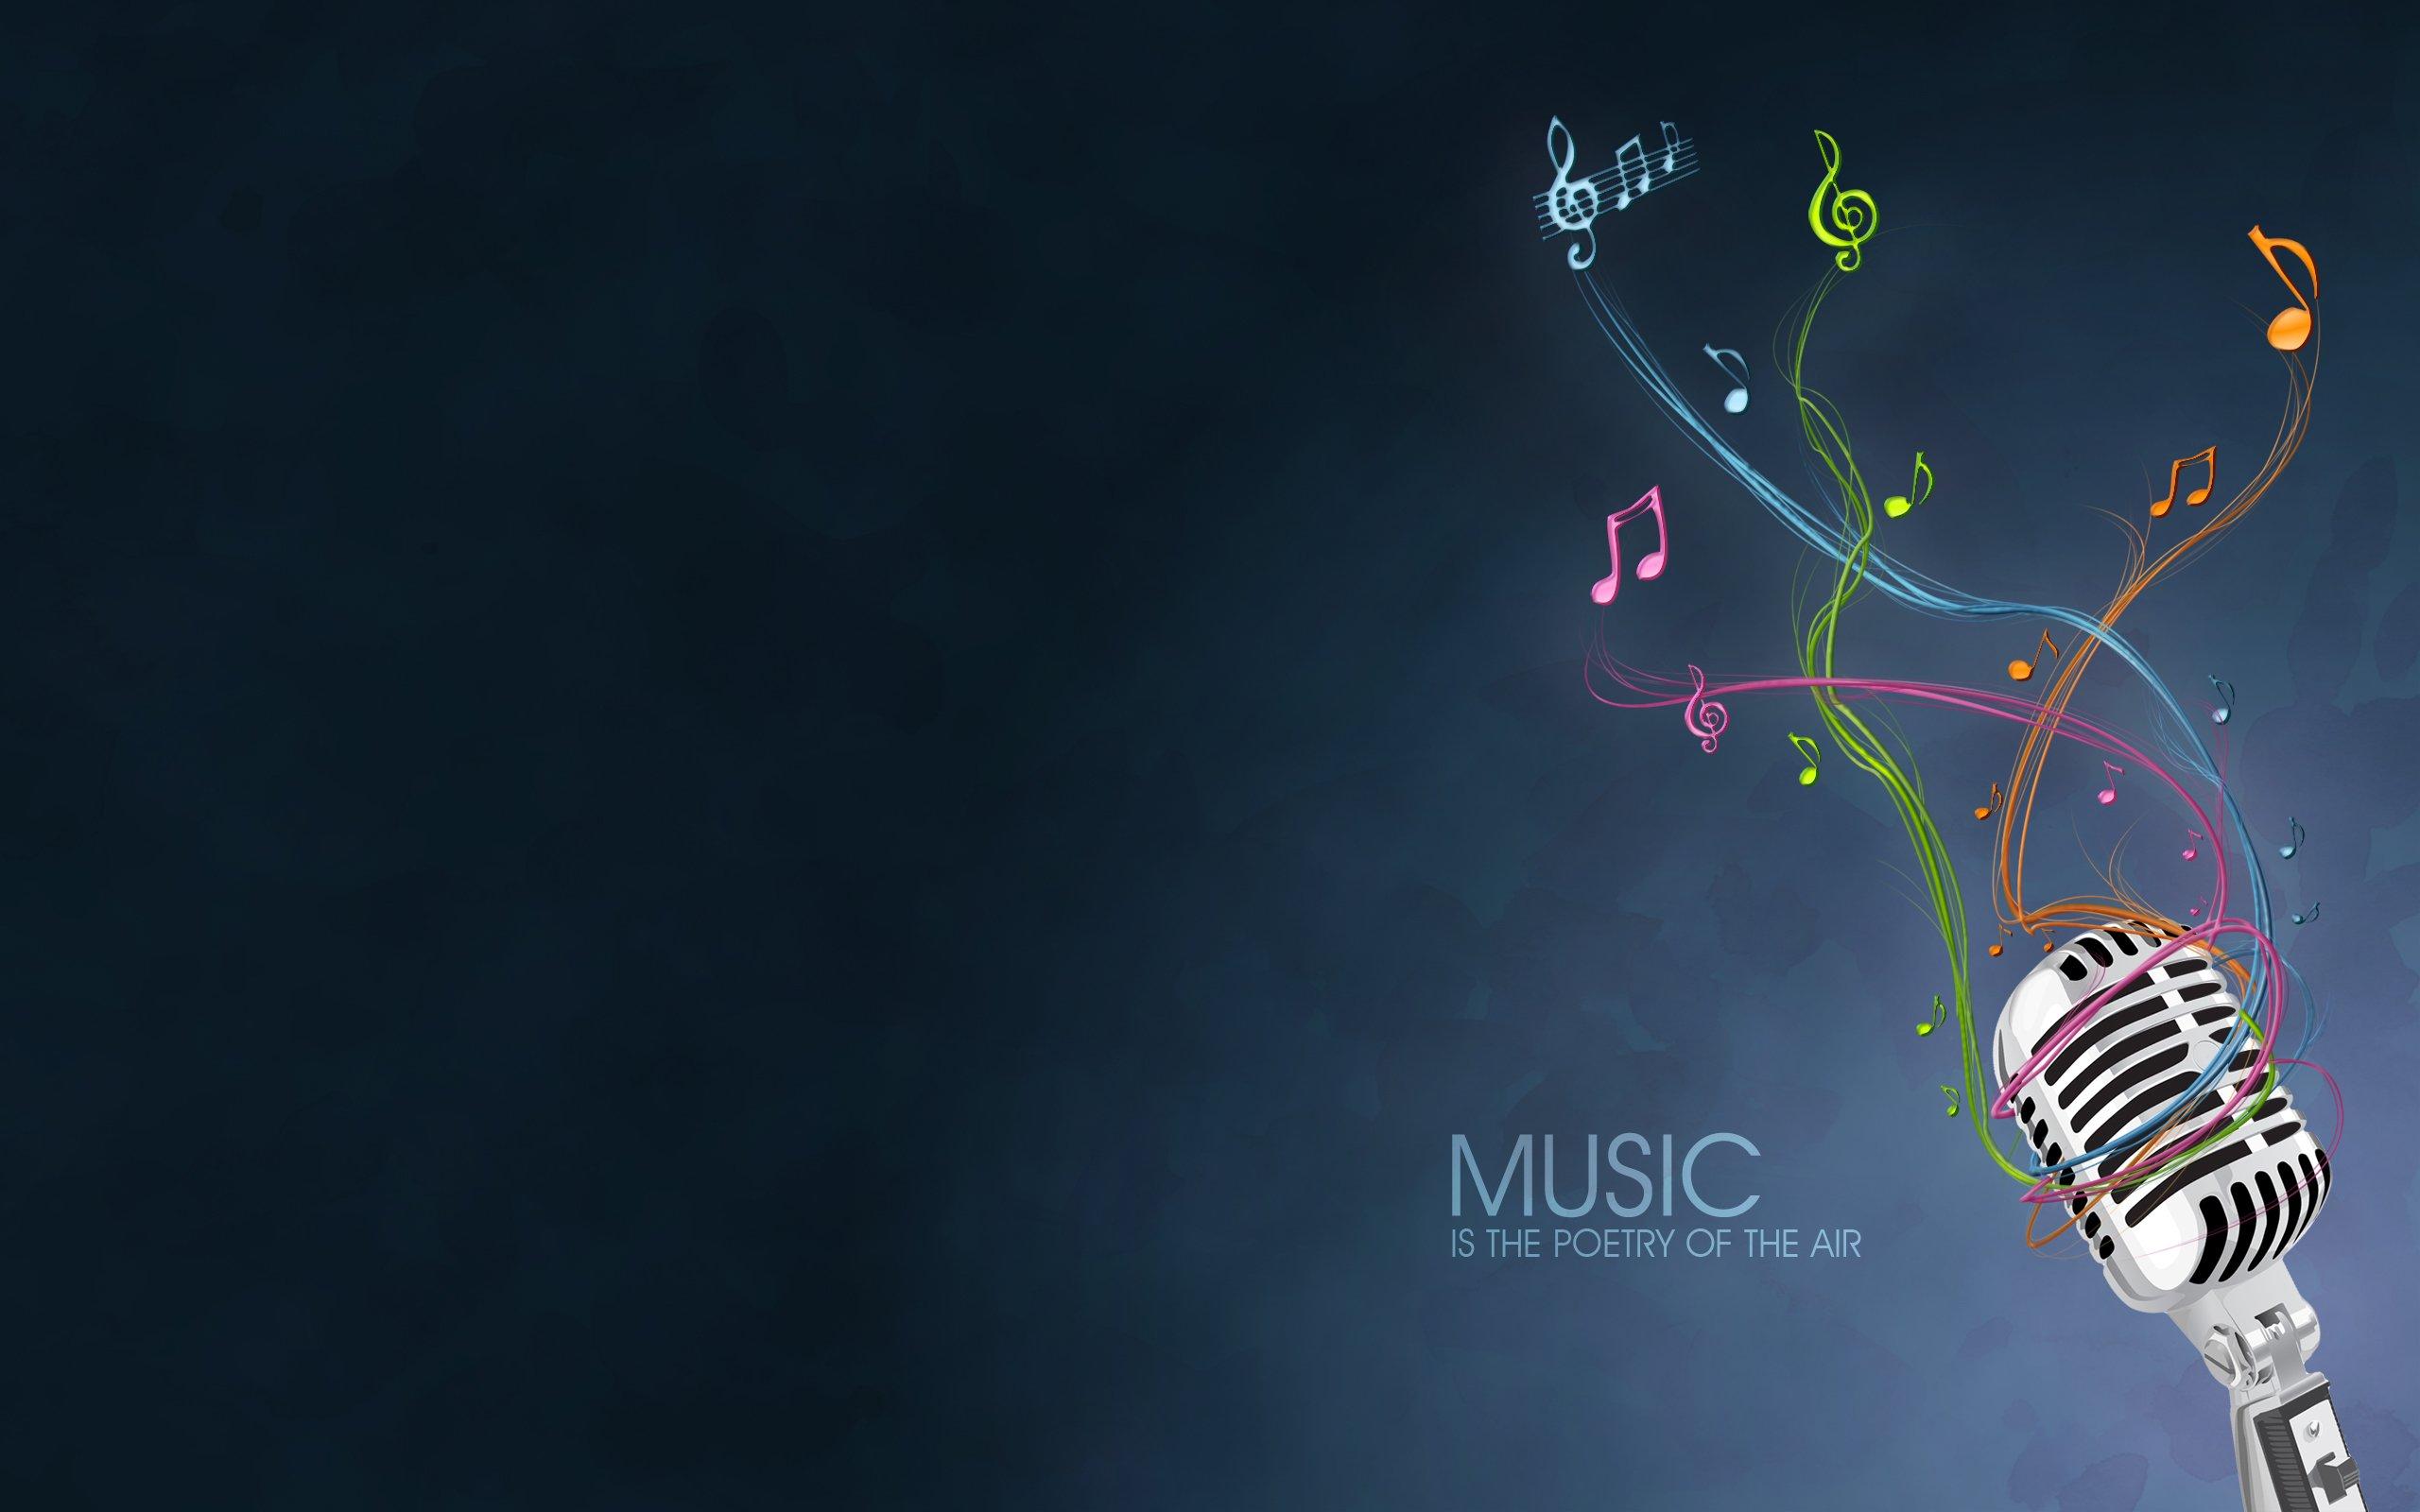 Best Music Wallpapers on WallpaperSafari